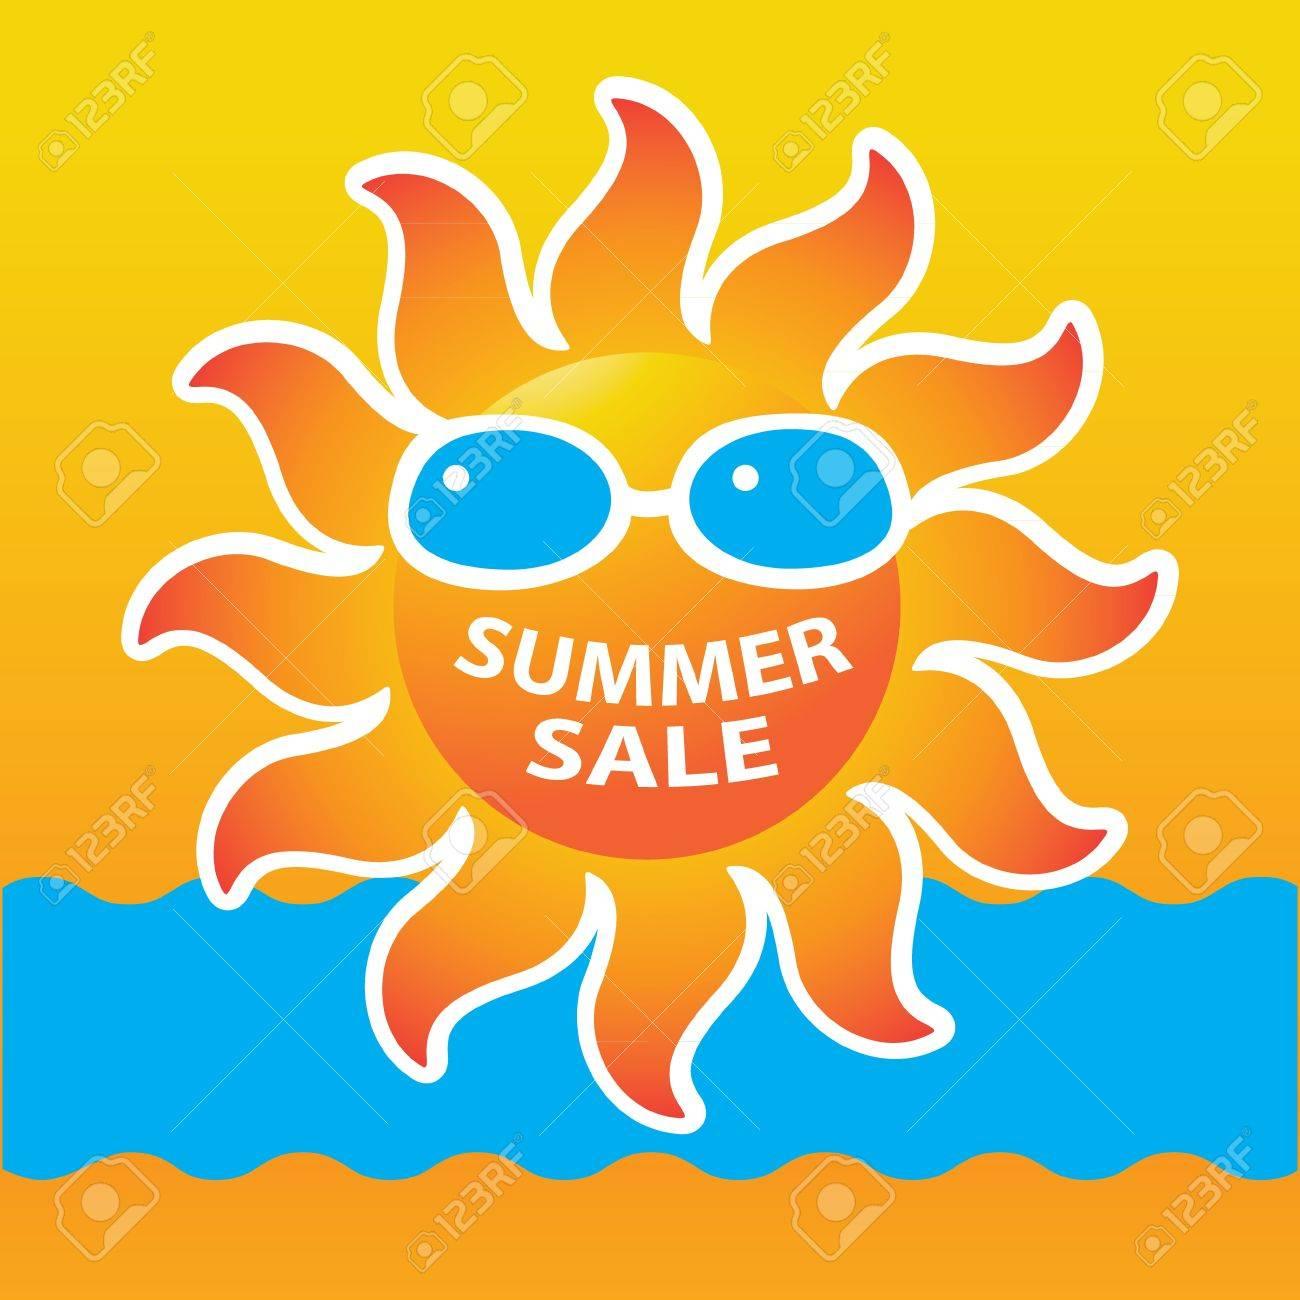 summer icon summer template summer fashion summer icon summer template summer fashion stock vector 17249575